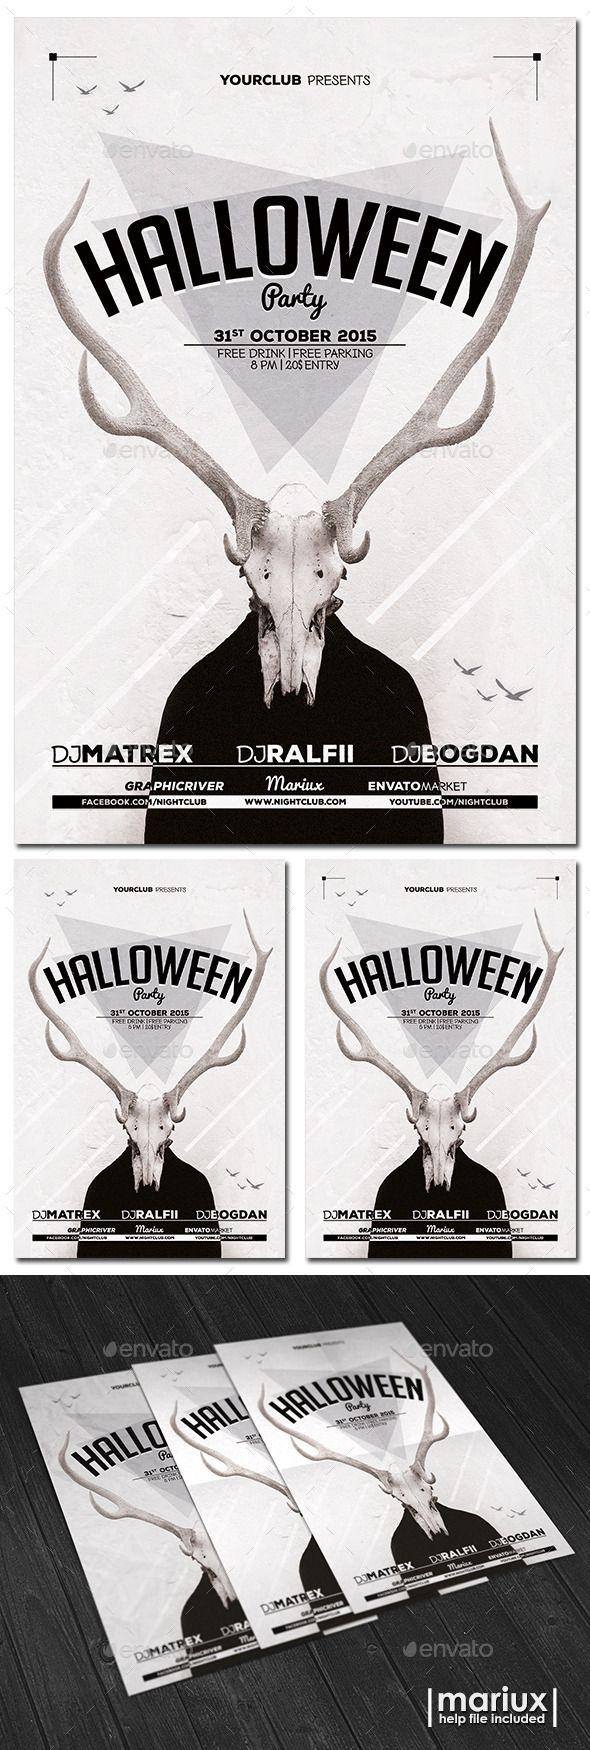 Halloween Party Flyer Template #design Download: http://graphicriver.net/item/halloween-party-flyer/12683819?ref=ksioks